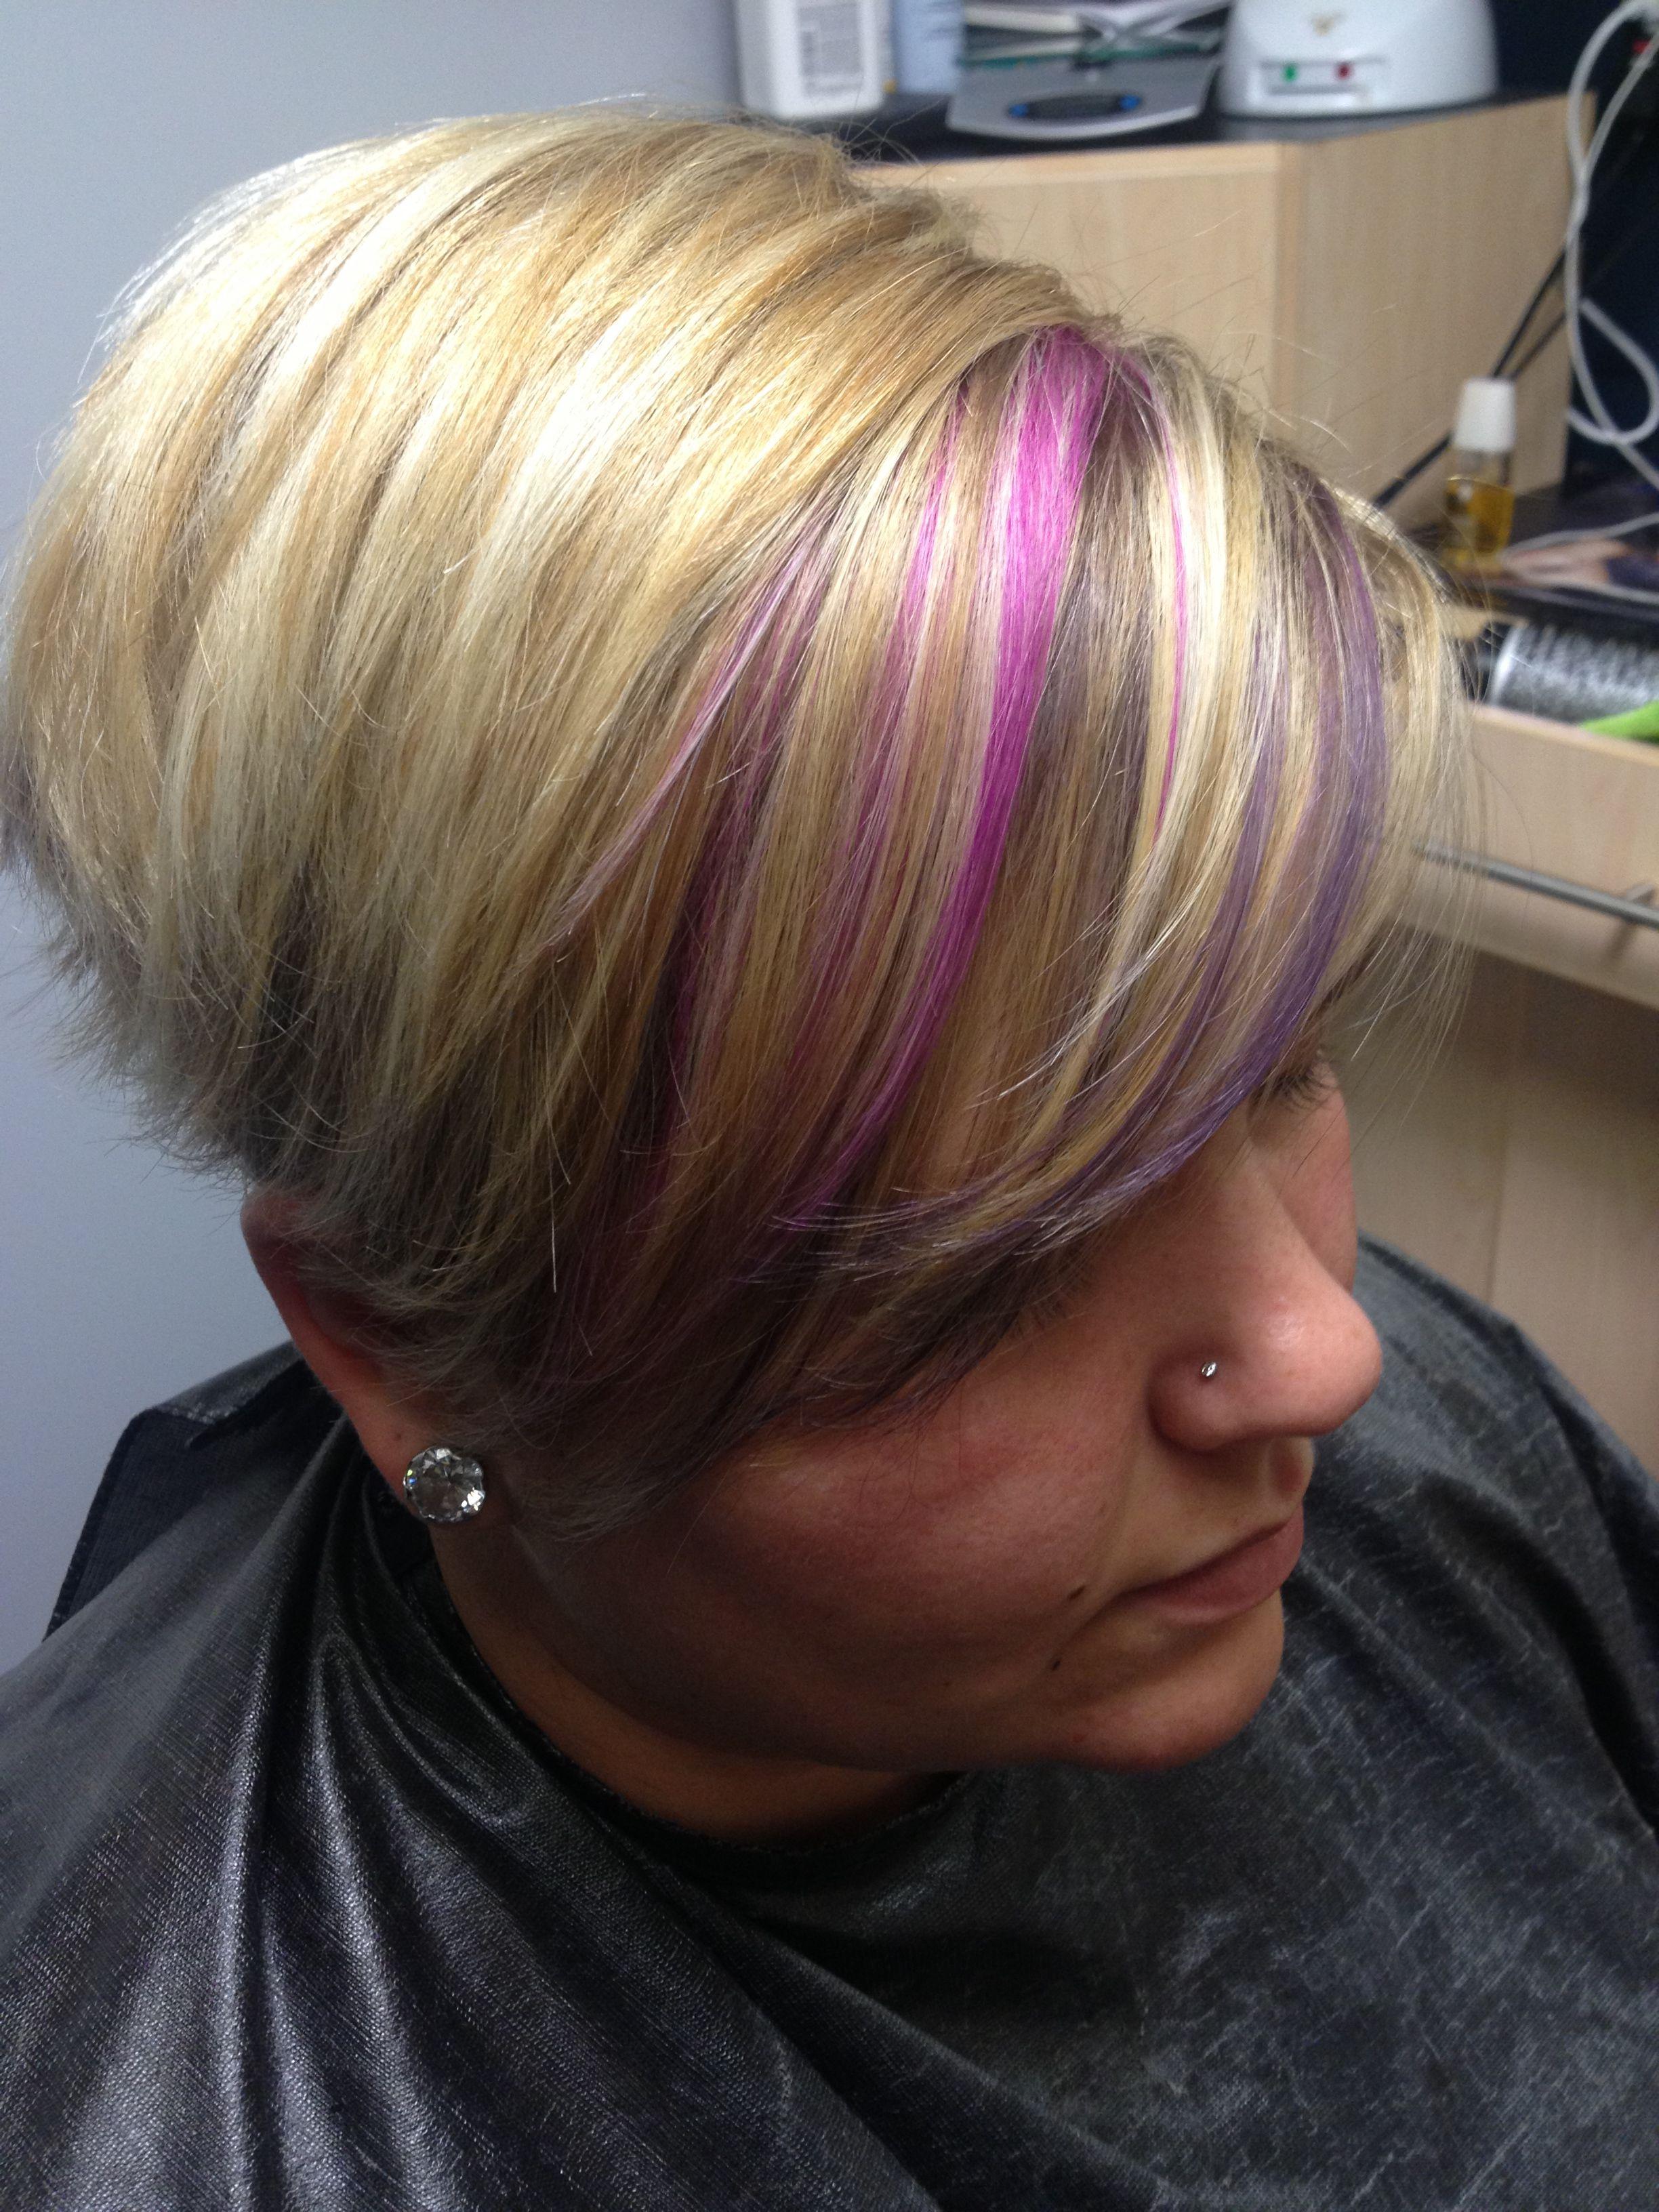 Photo Gallery Of Spiky Mohawk Hairstyles With Pink Peekaboo Streaks